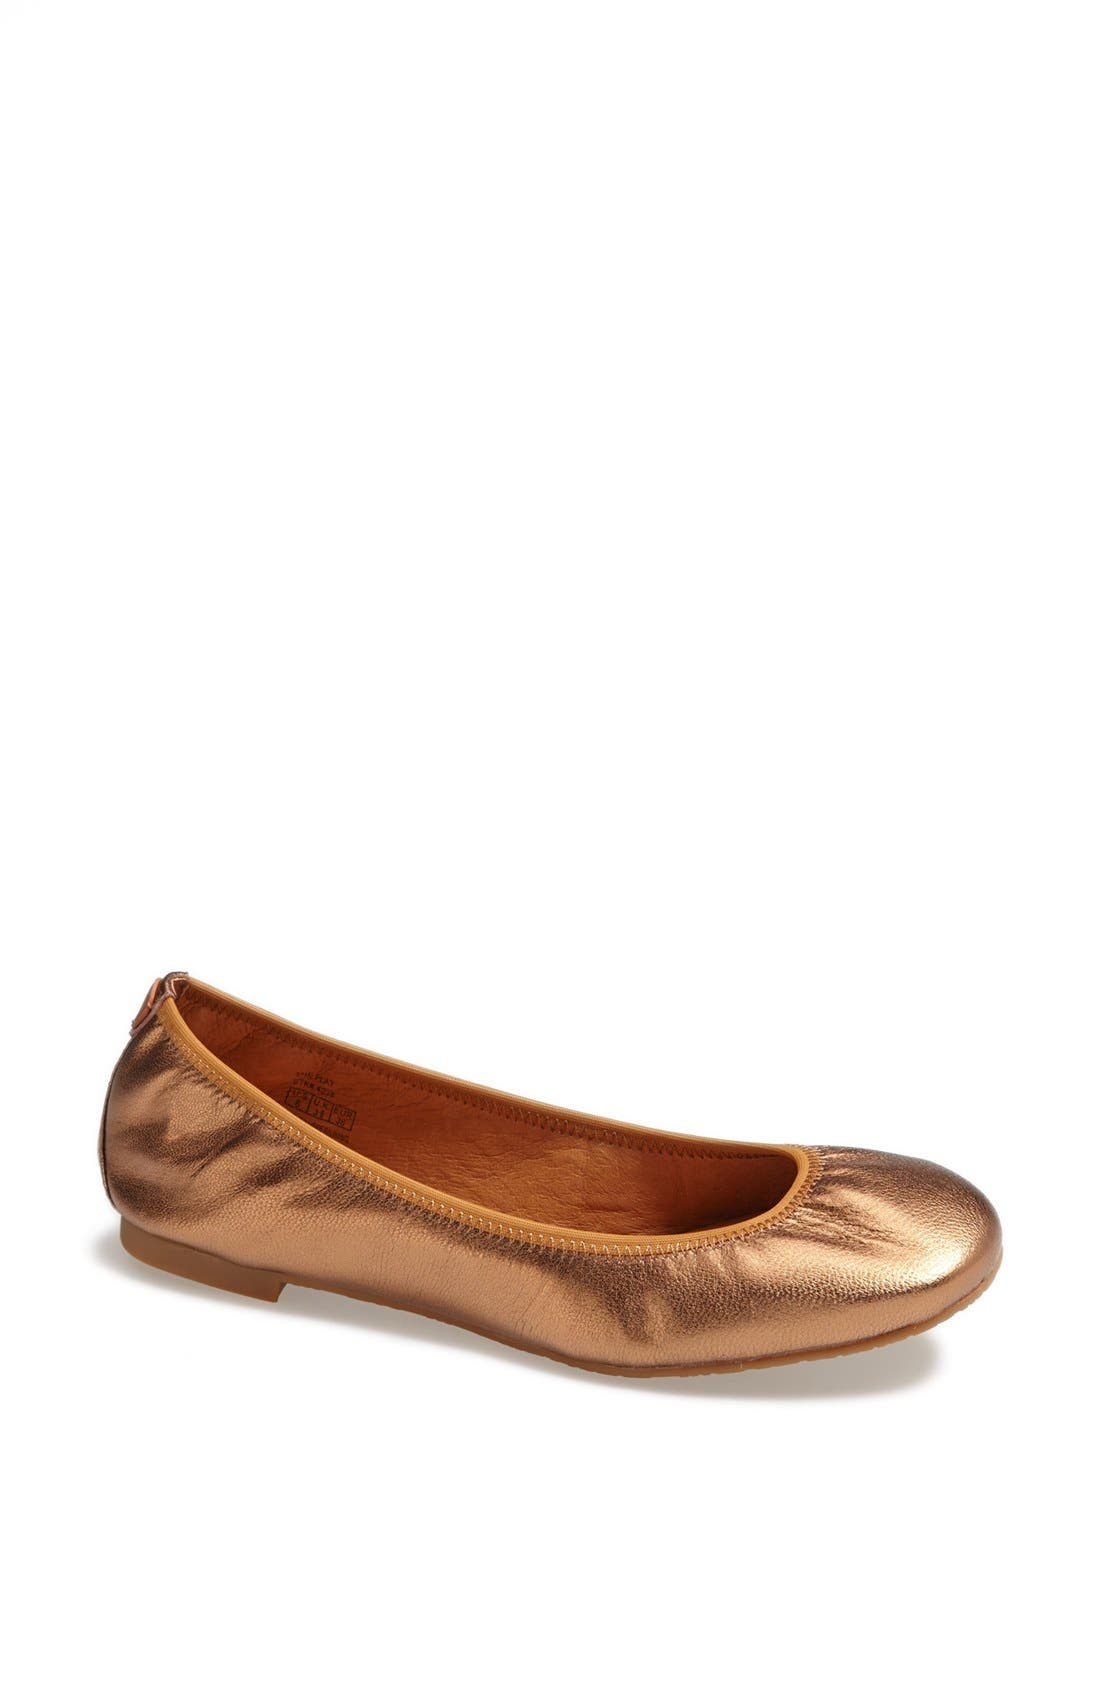 Main Image - Juil 'The Flat' Earthing Metallic Leather Ballet Flat